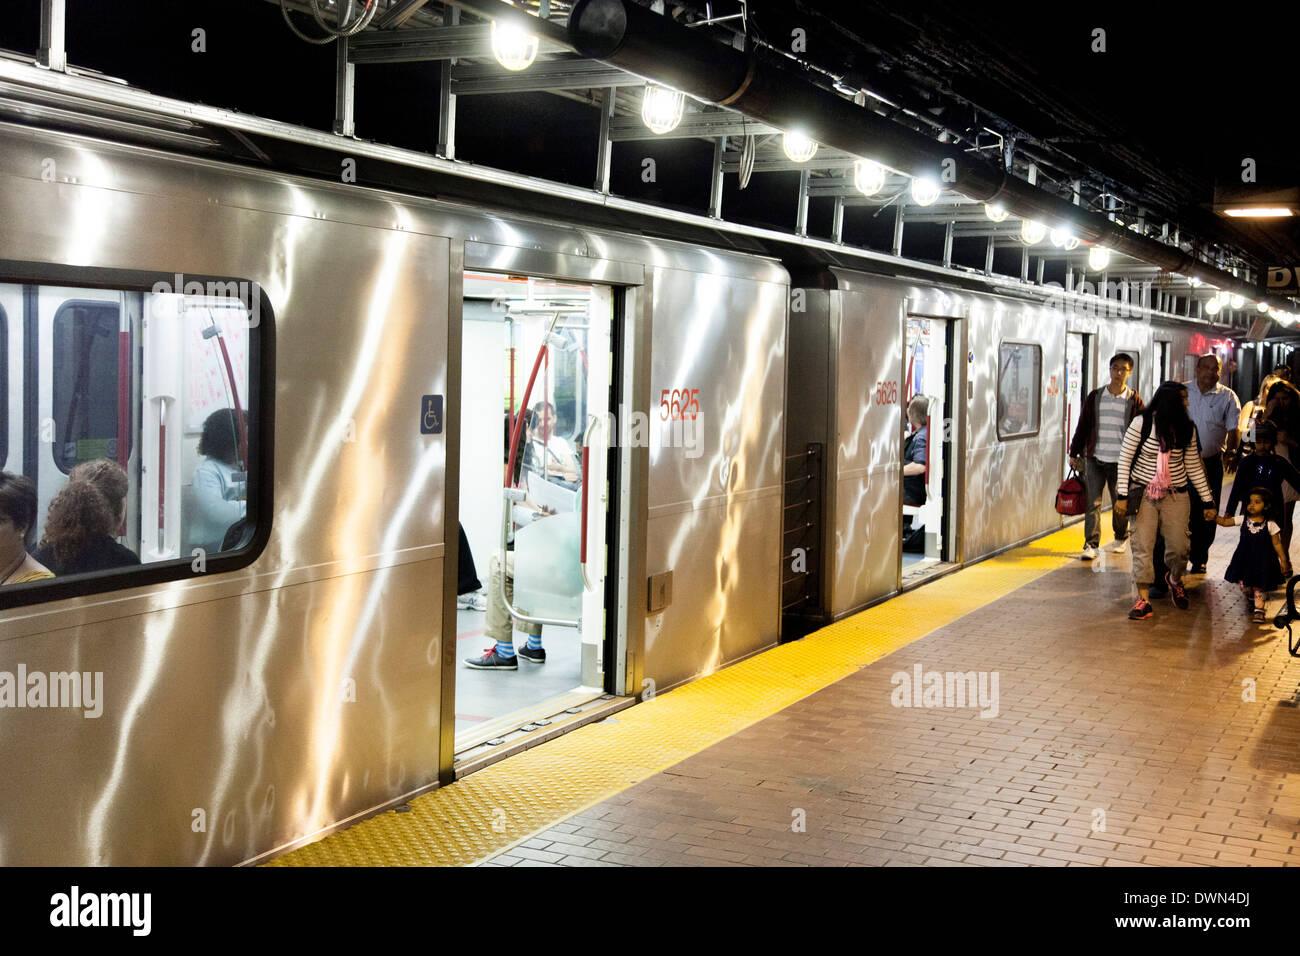 Subway train at King station in Toronto, Ontario,Canada. Stock Photo